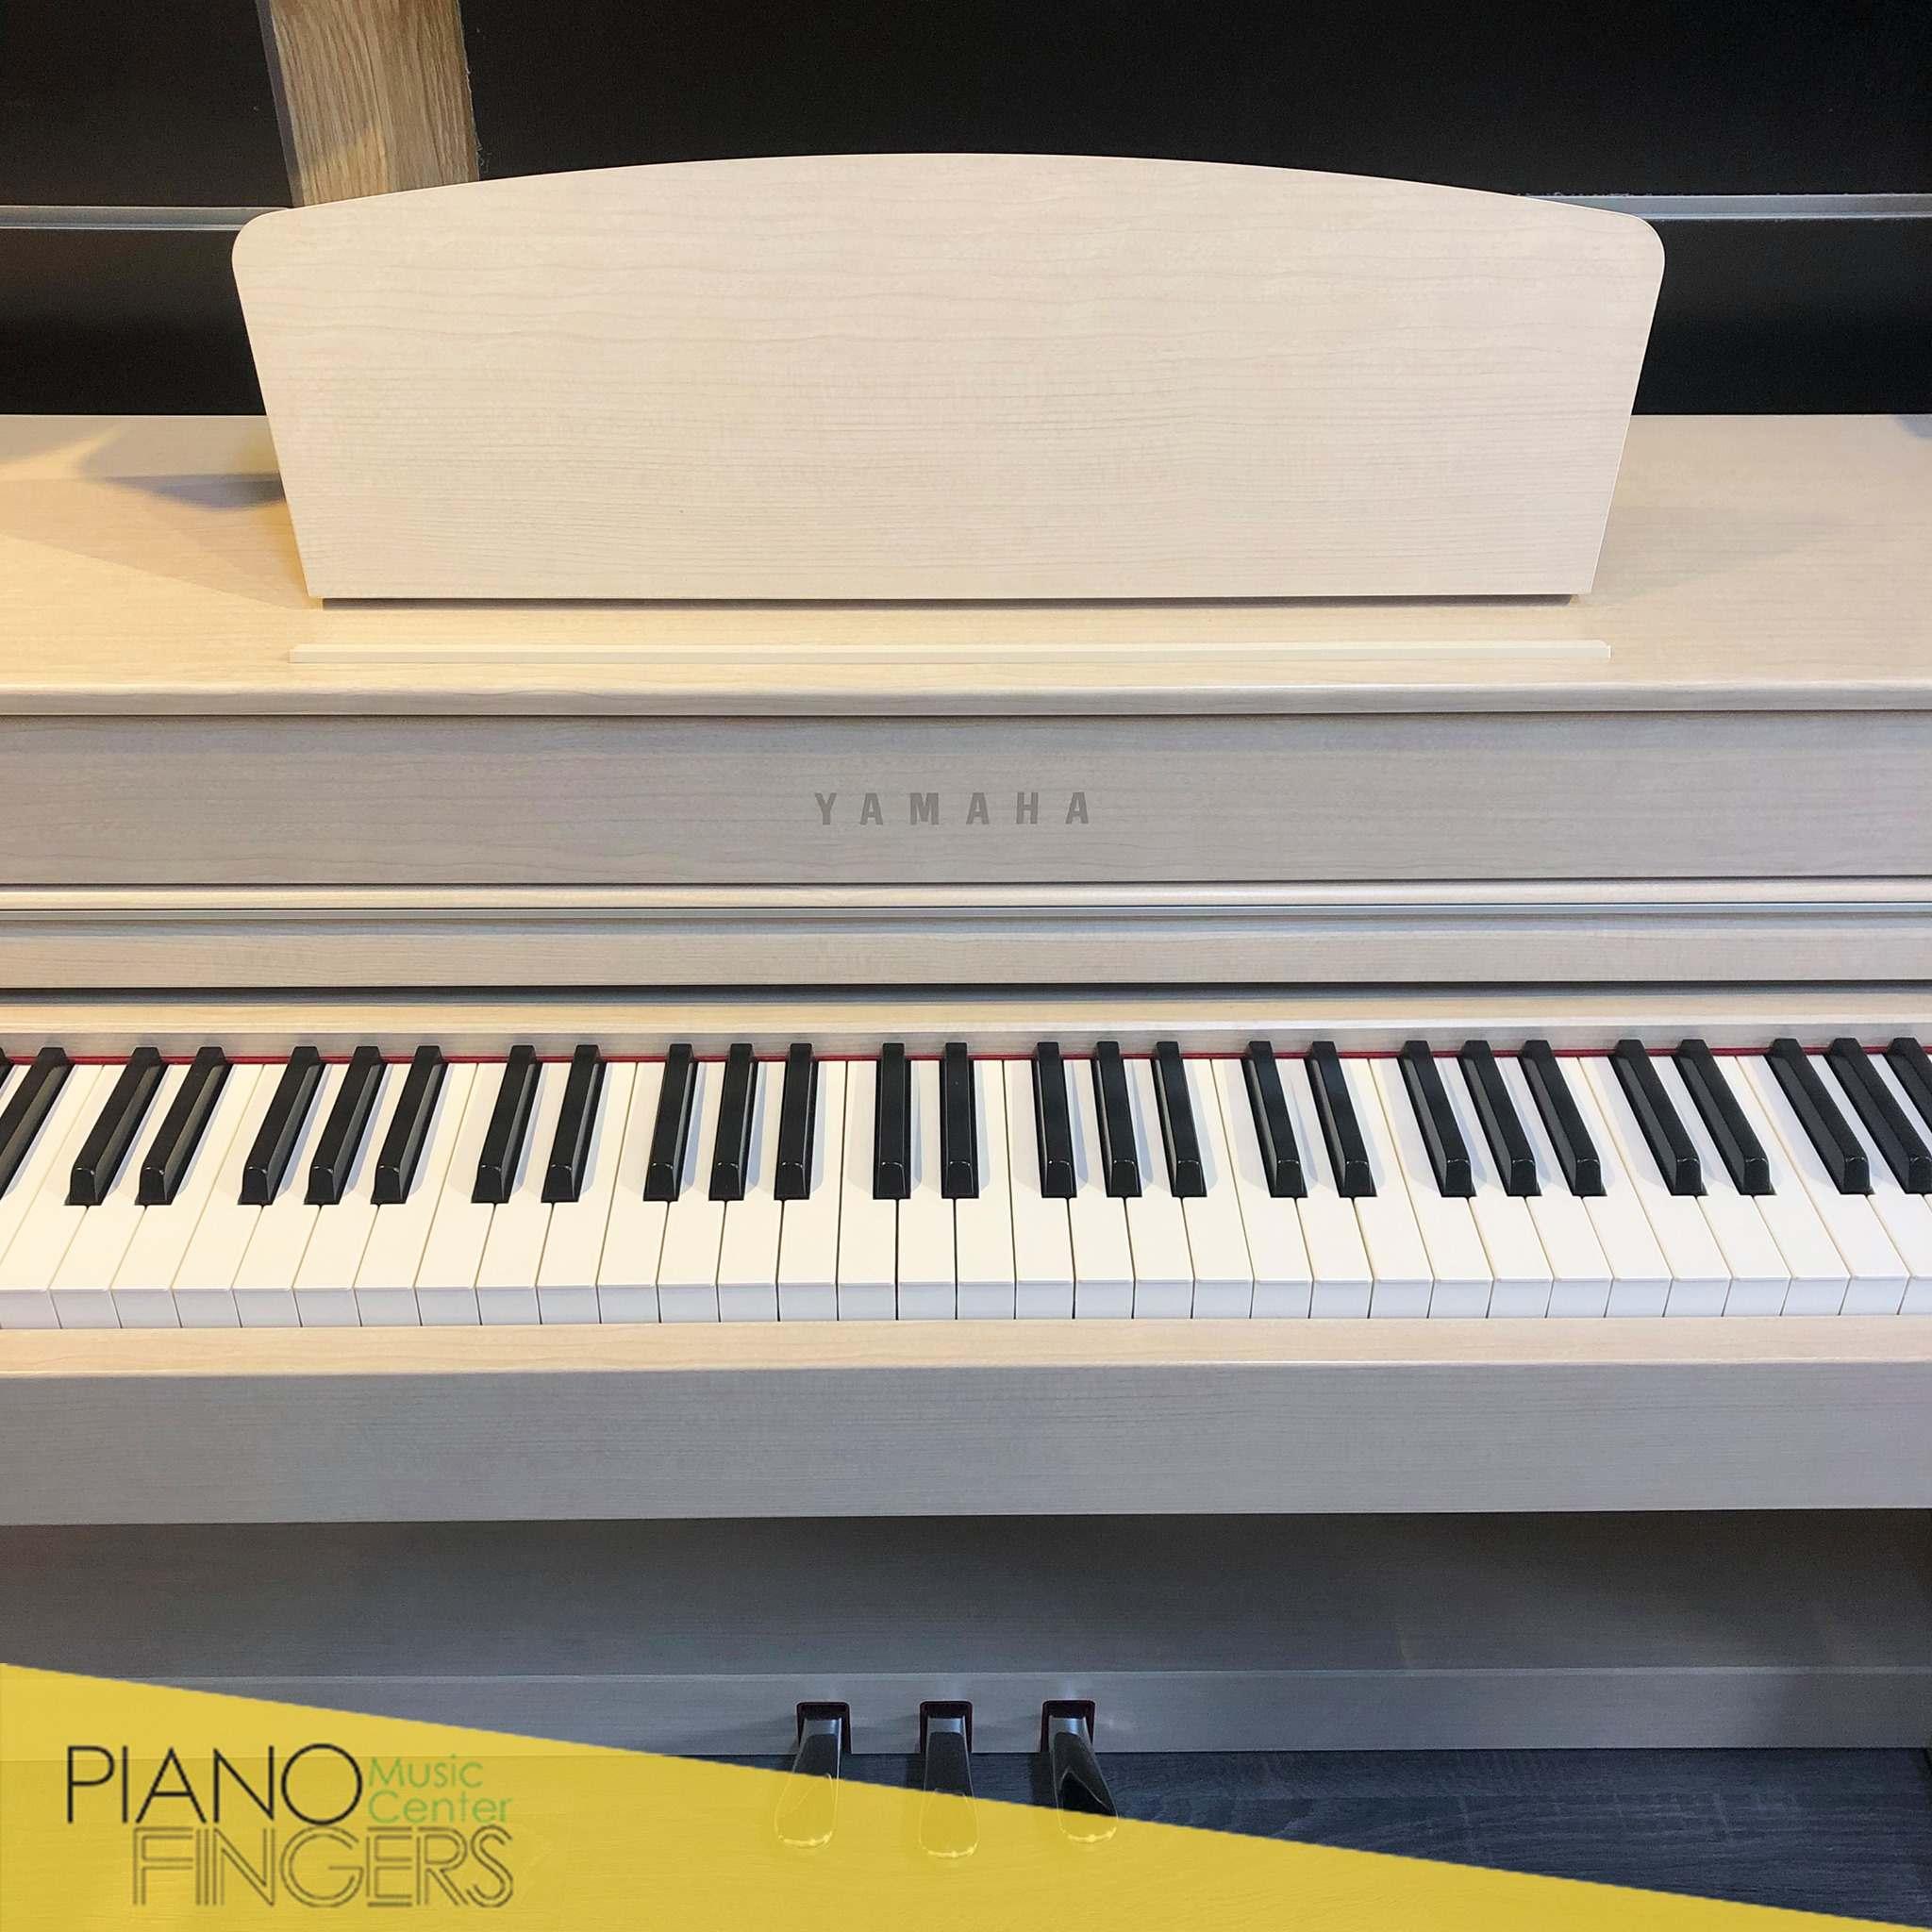 cach-kiem-tra-dan-piano-dien-cu-3